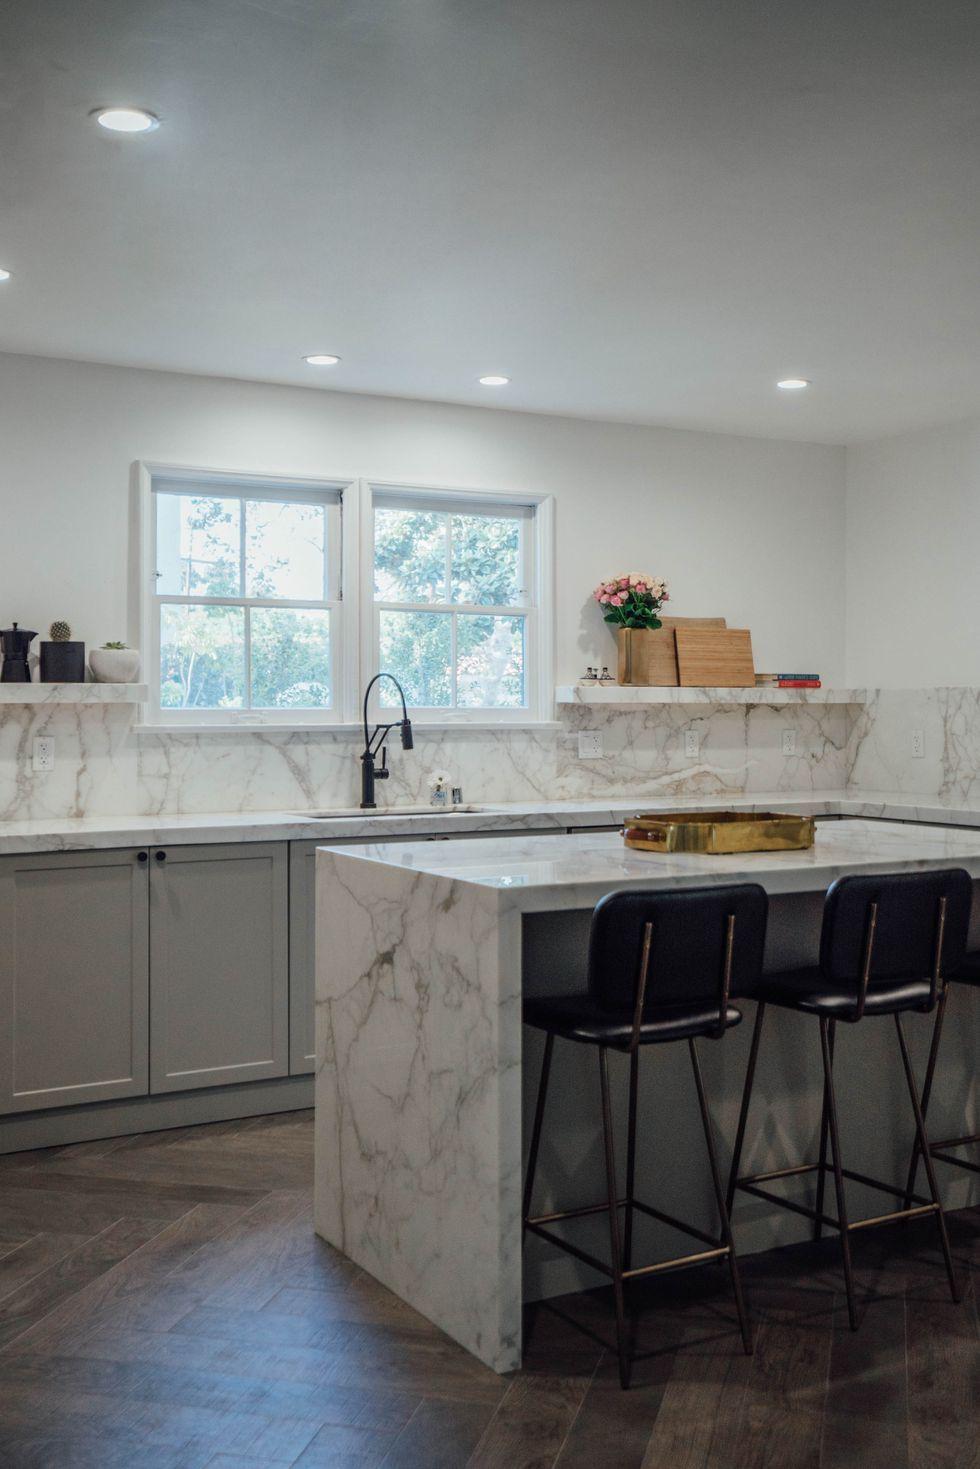 Elle Decor & Gorgeous Modern Kitchen Designs - Inspiration for ...